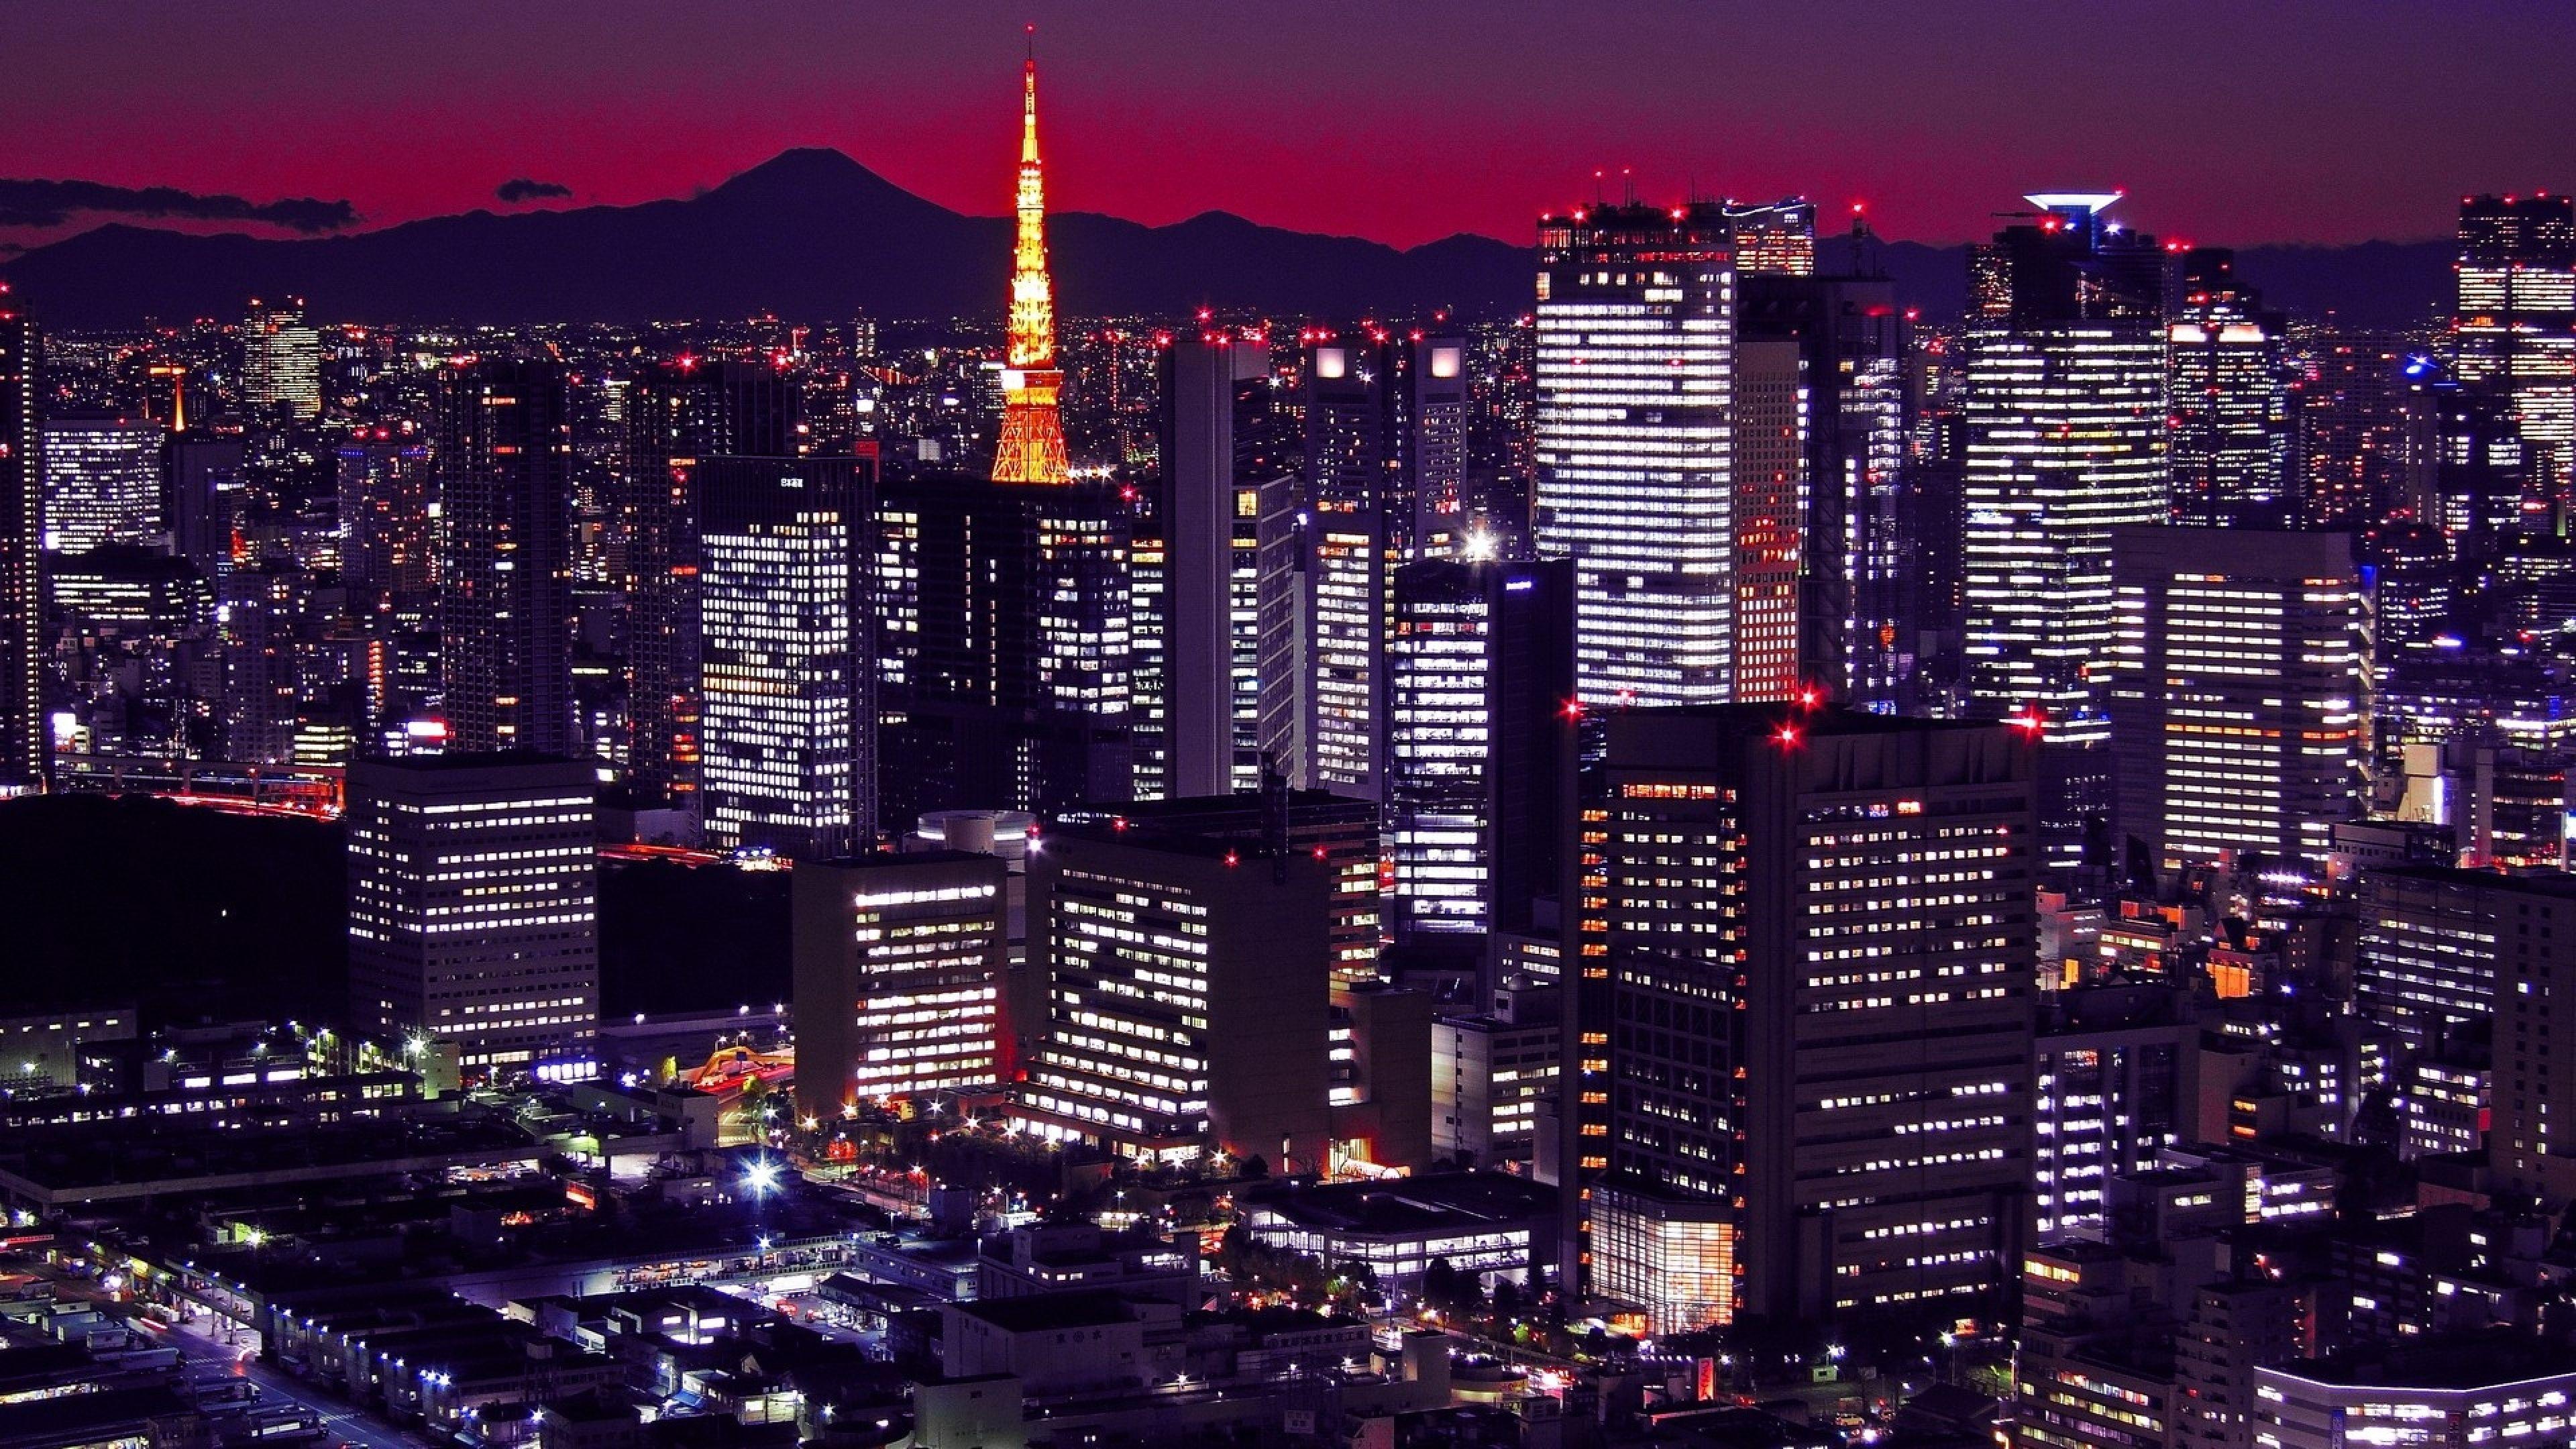 Tokyo 4k Wallpapers Top Free Tokyo 4k Backgrounds Wallpaperaccess